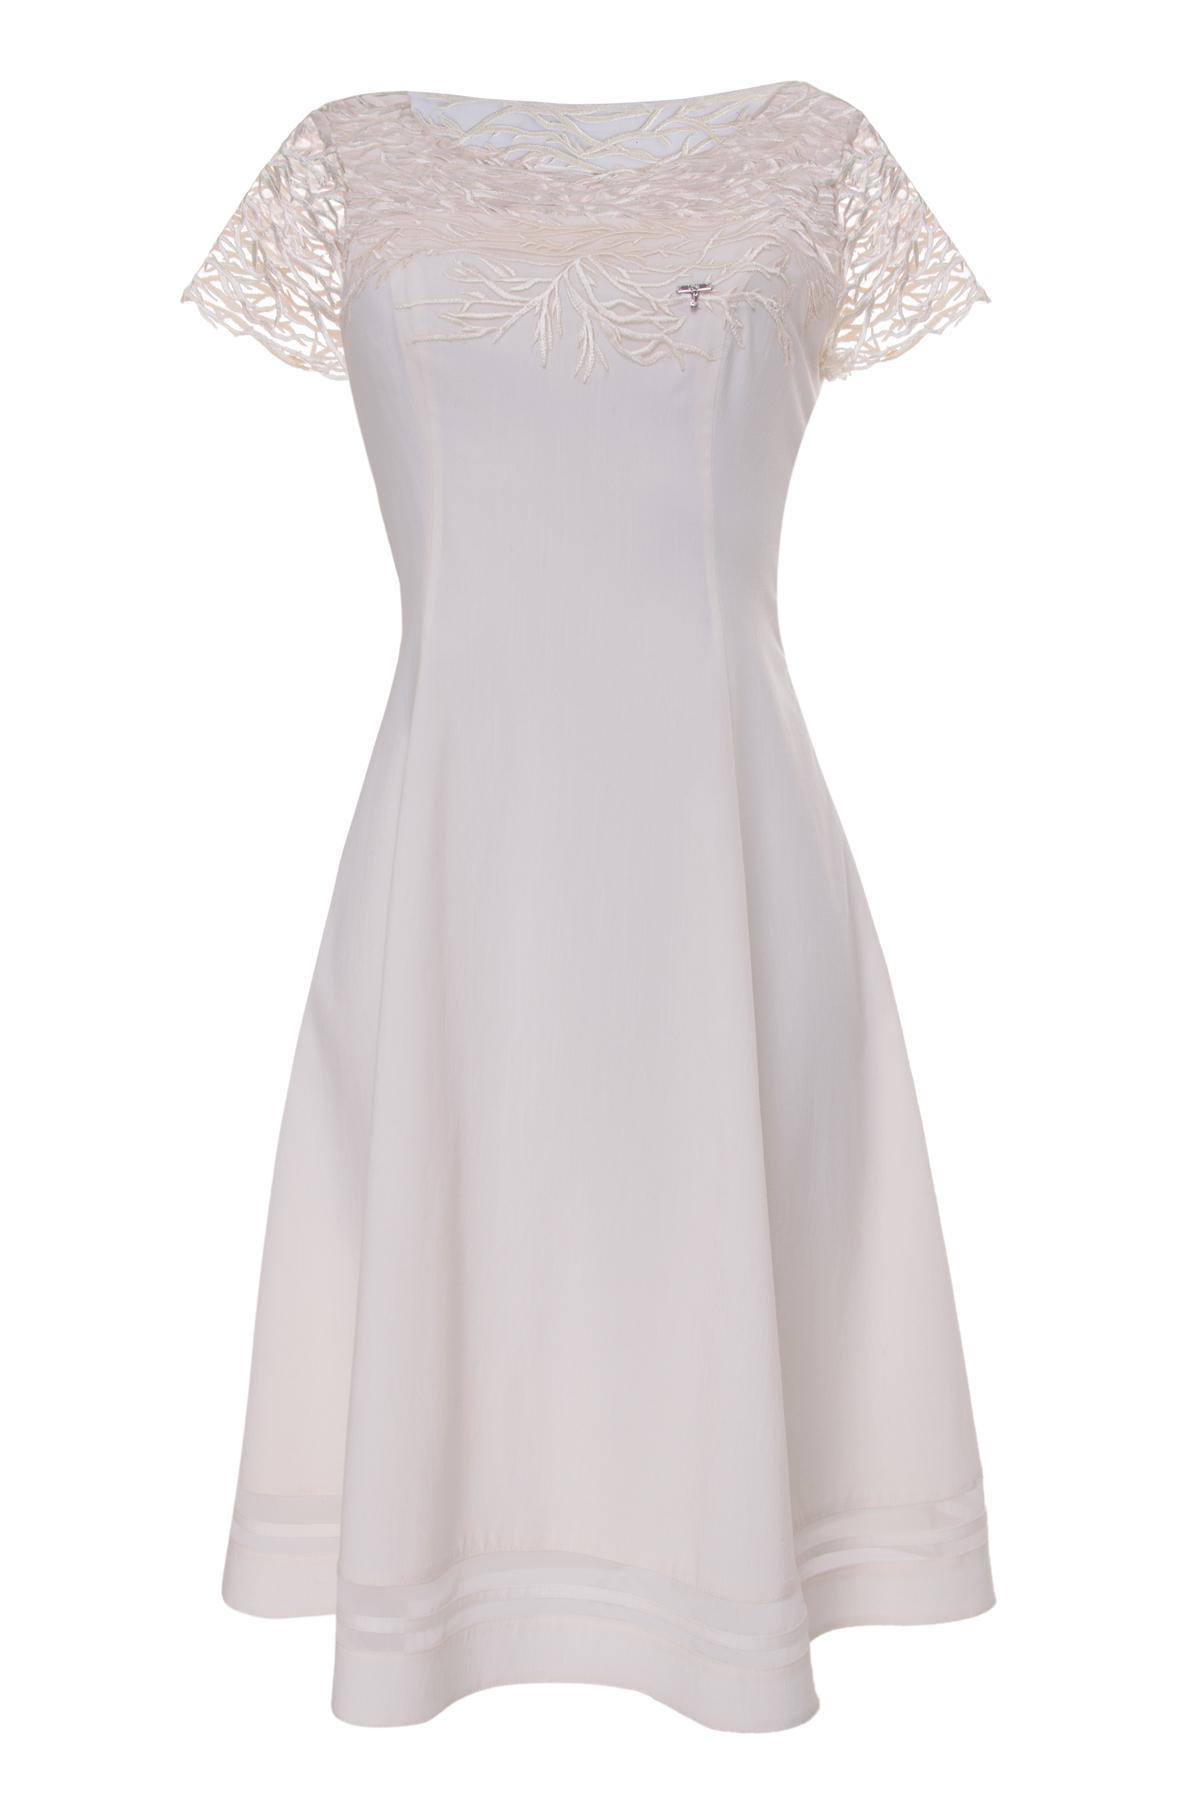 WIDE DRESS ISKRA 2